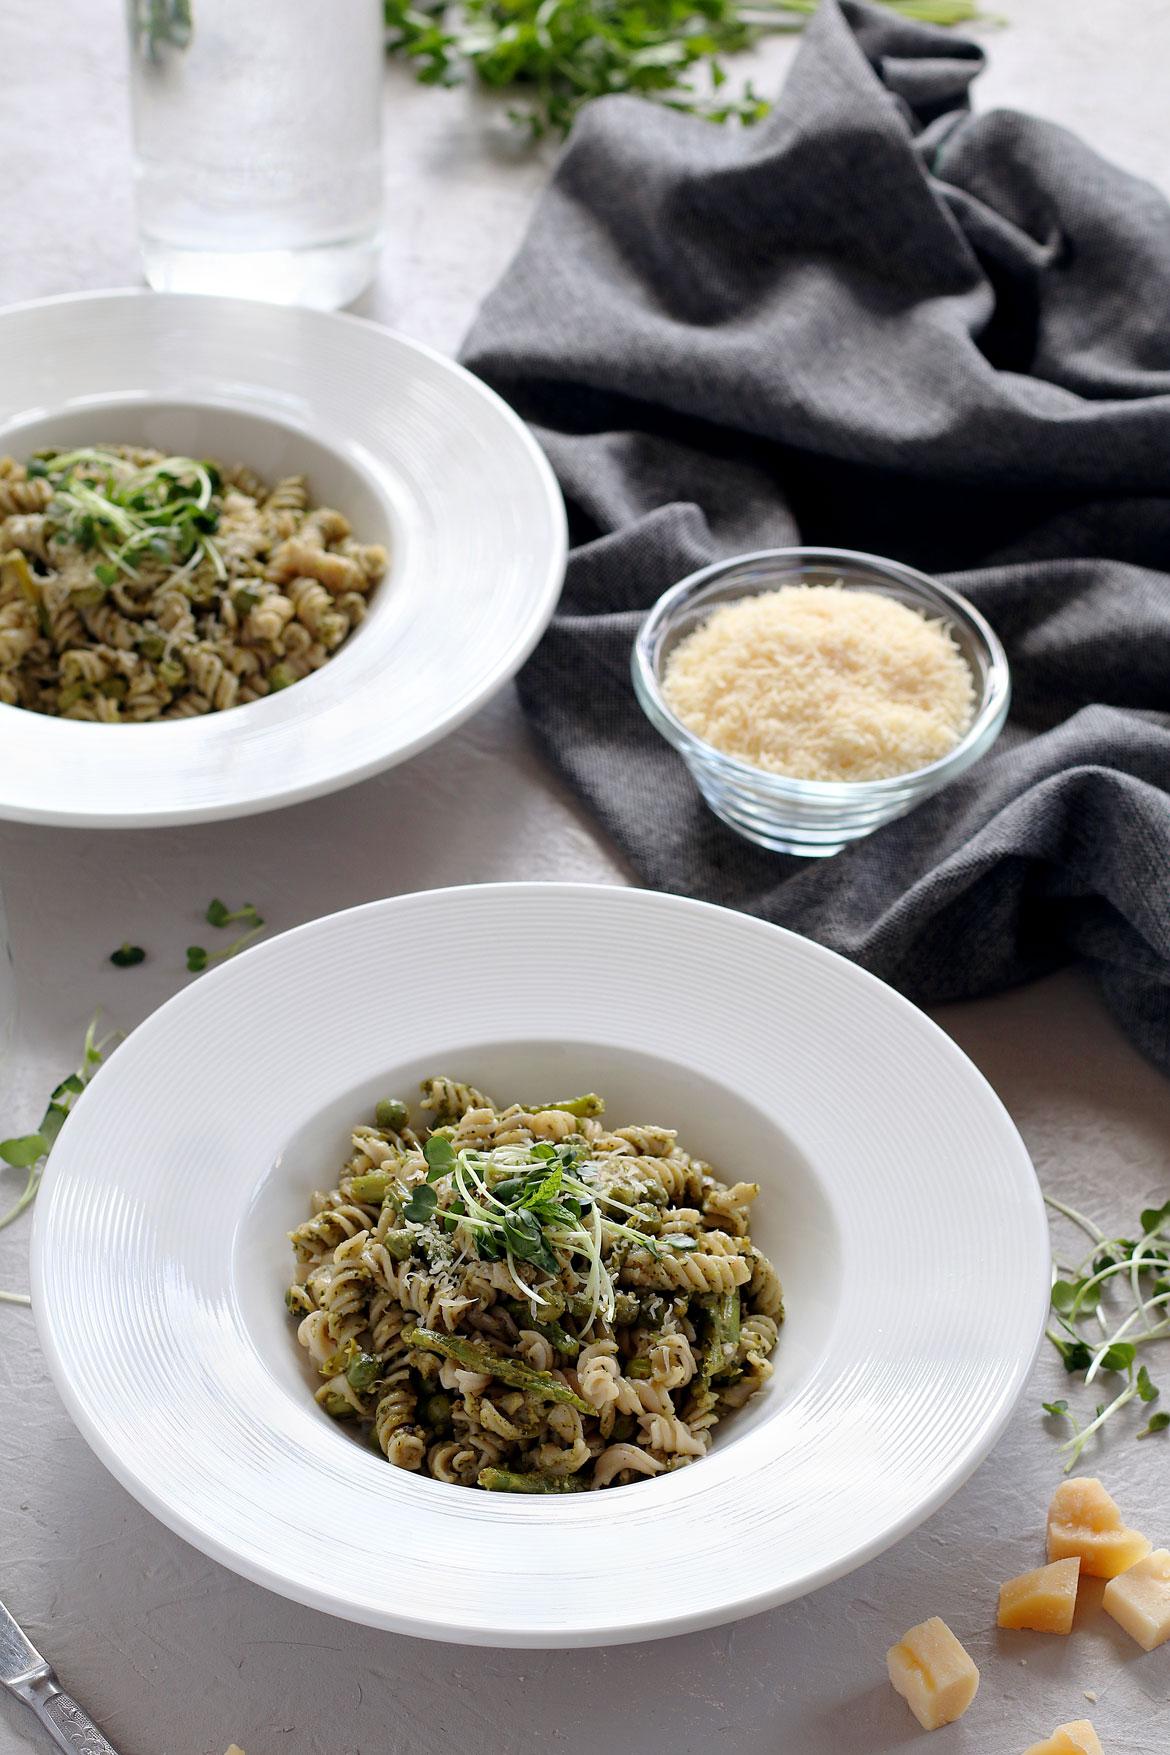 Asparagus, green pea & pesto pasta | stayforabite.com